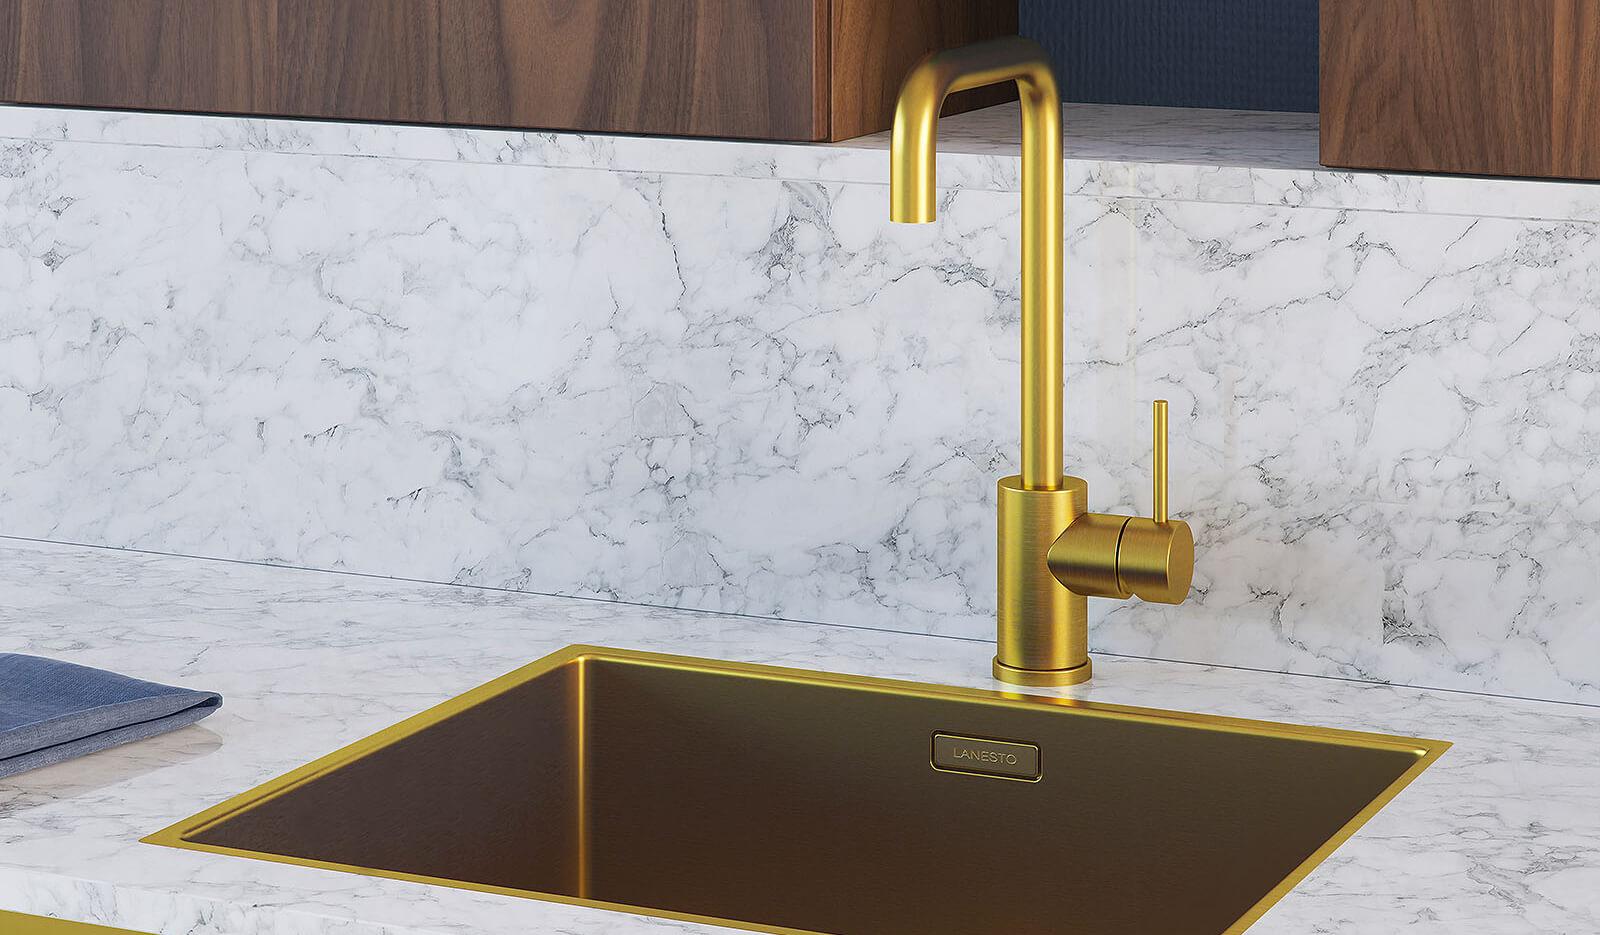 Keuken Olympia nachtblauw - gouden kraan en wasbak